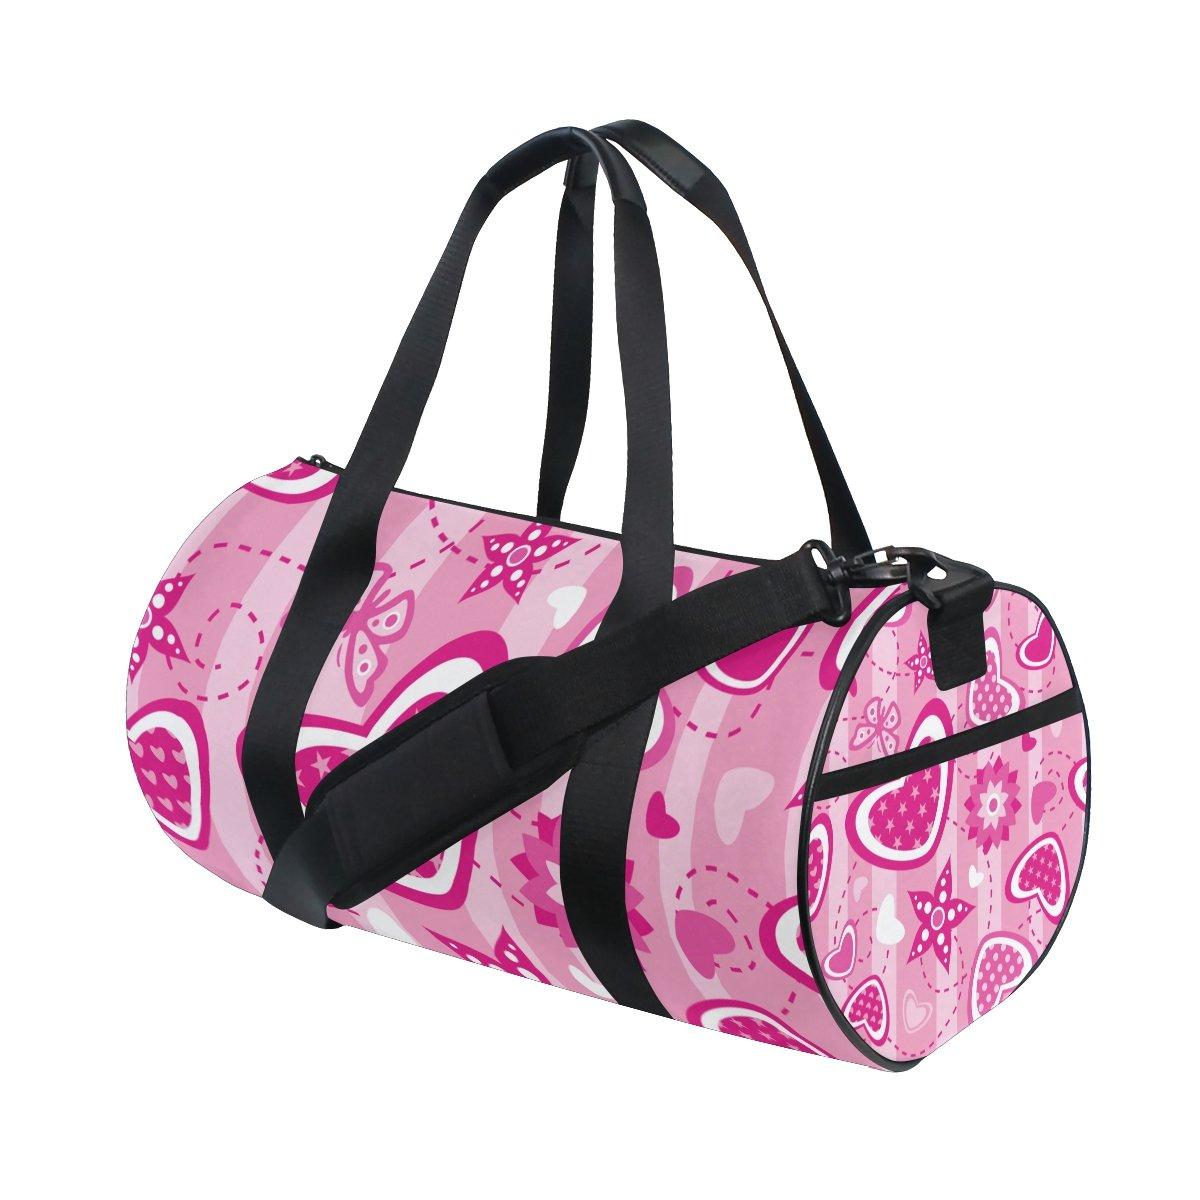 U LIFE Spring Summer Valentines Day Love Heart Butterfly Stars Sports Gym Shoulder Handy Duffel Bags for Women Men Kids Boys Girls